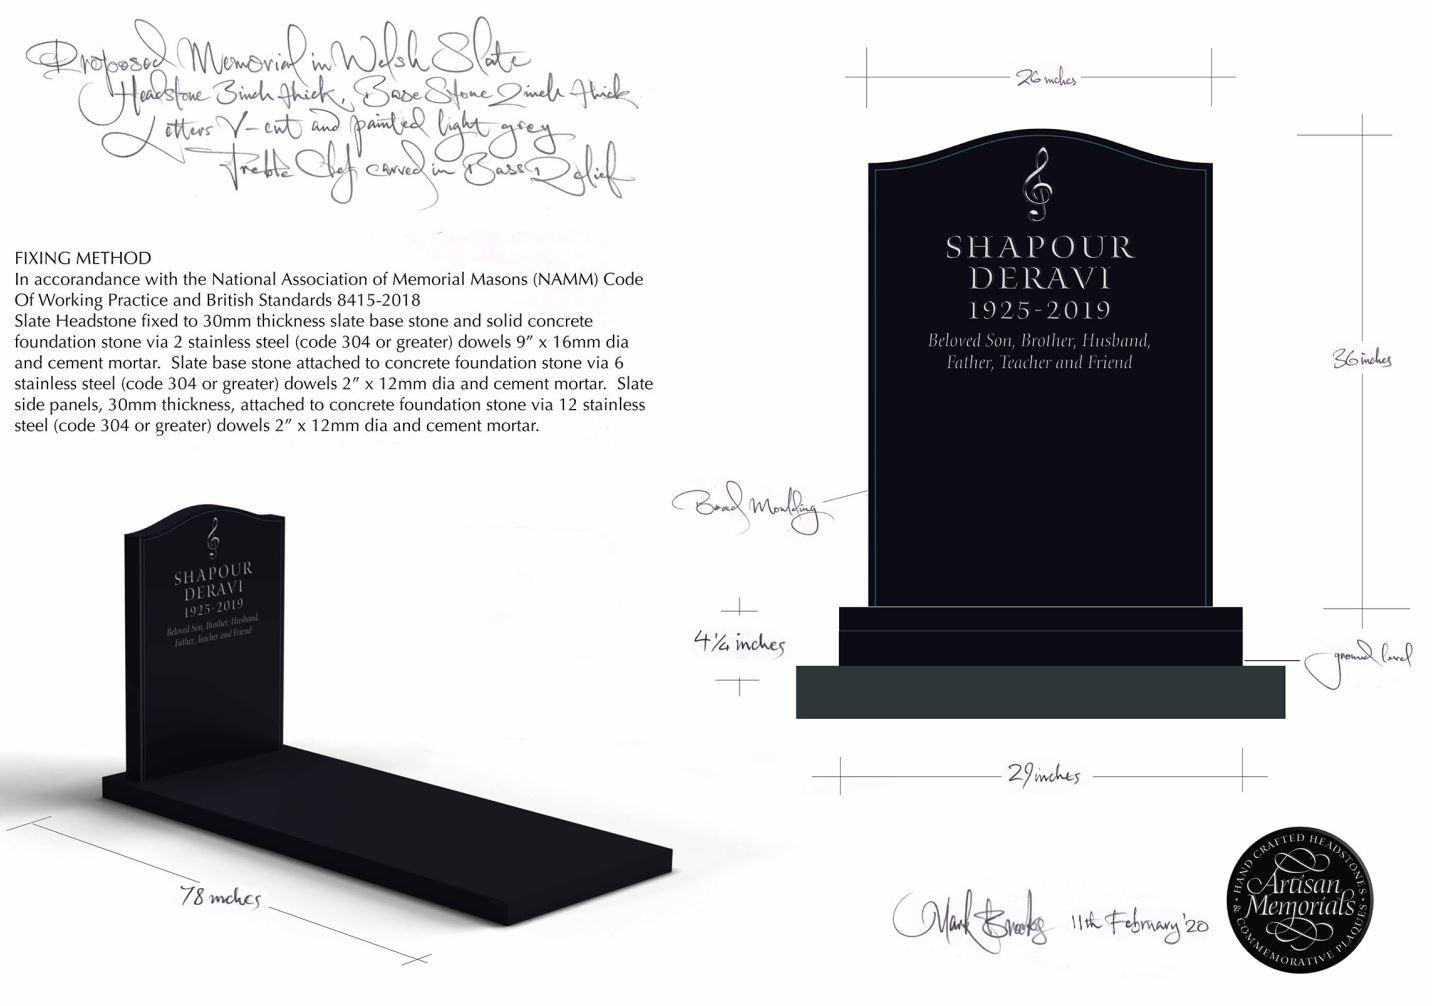 Designing a memorial - Headstones, Gravestones and Grave Stones